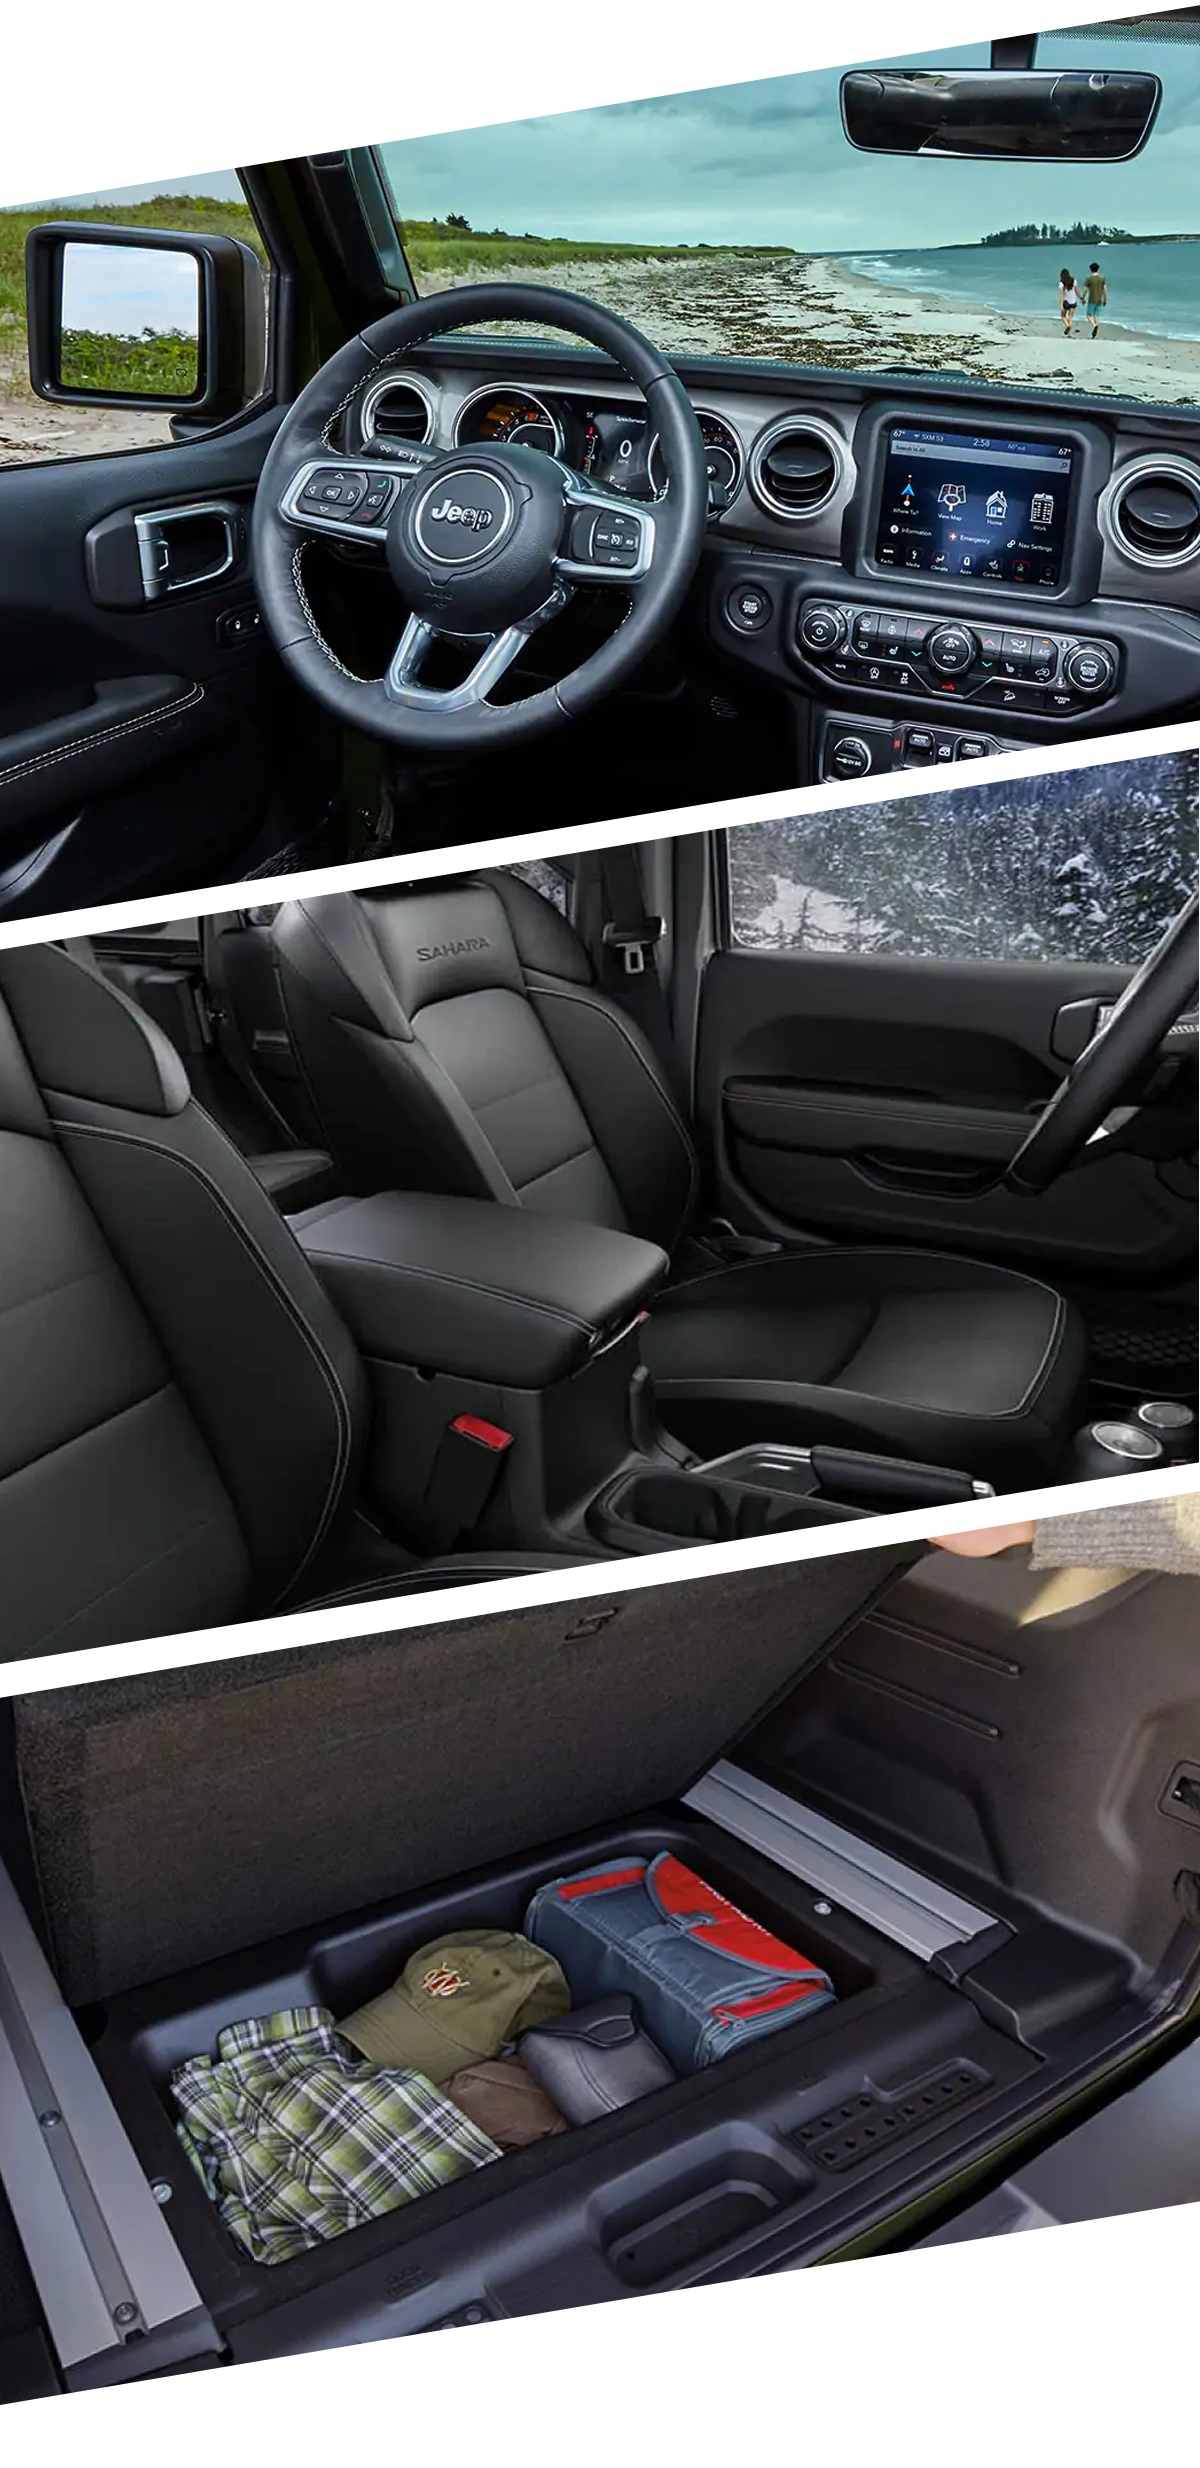 2021 Jeep Wrangler Interior Paris, TX